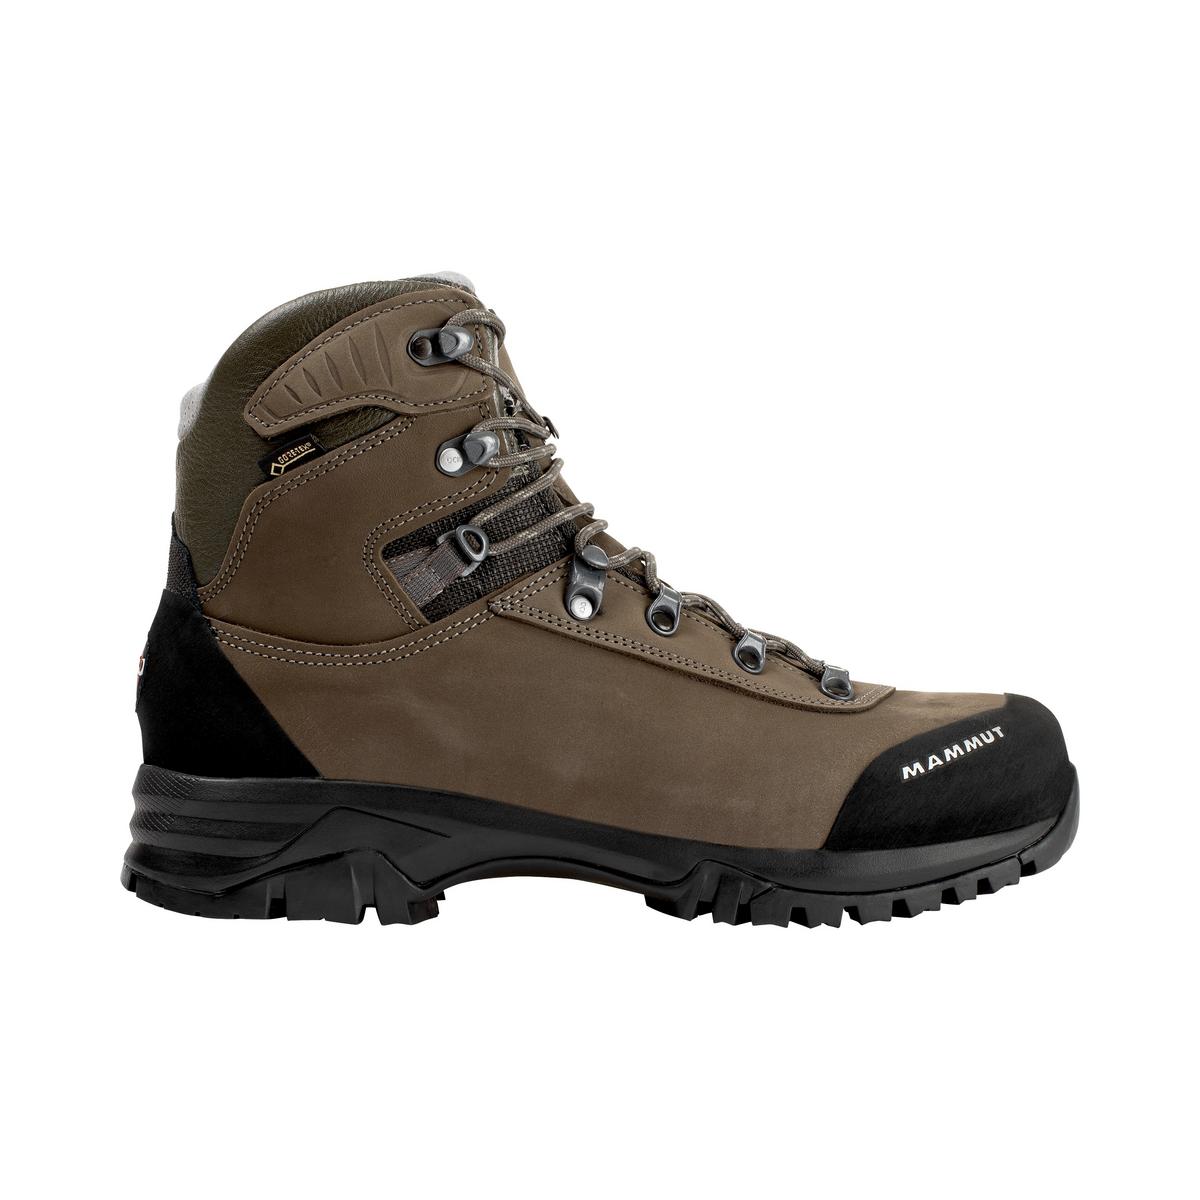 Mammut Womens Trovat Advanced High GTX Rise Hiking Shoes